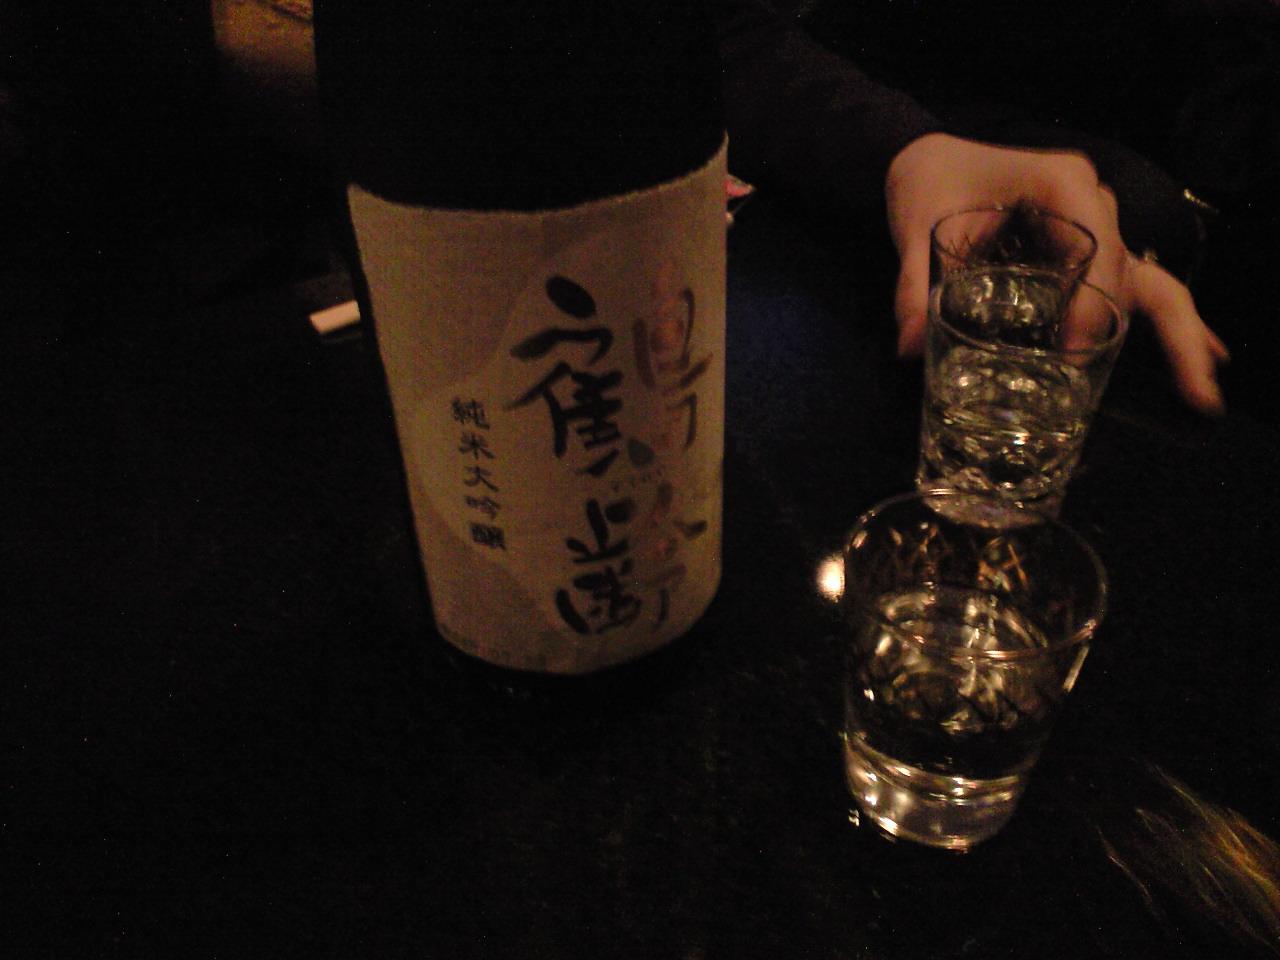 日本酒で乾杯〜! 新潟県 鶴齢